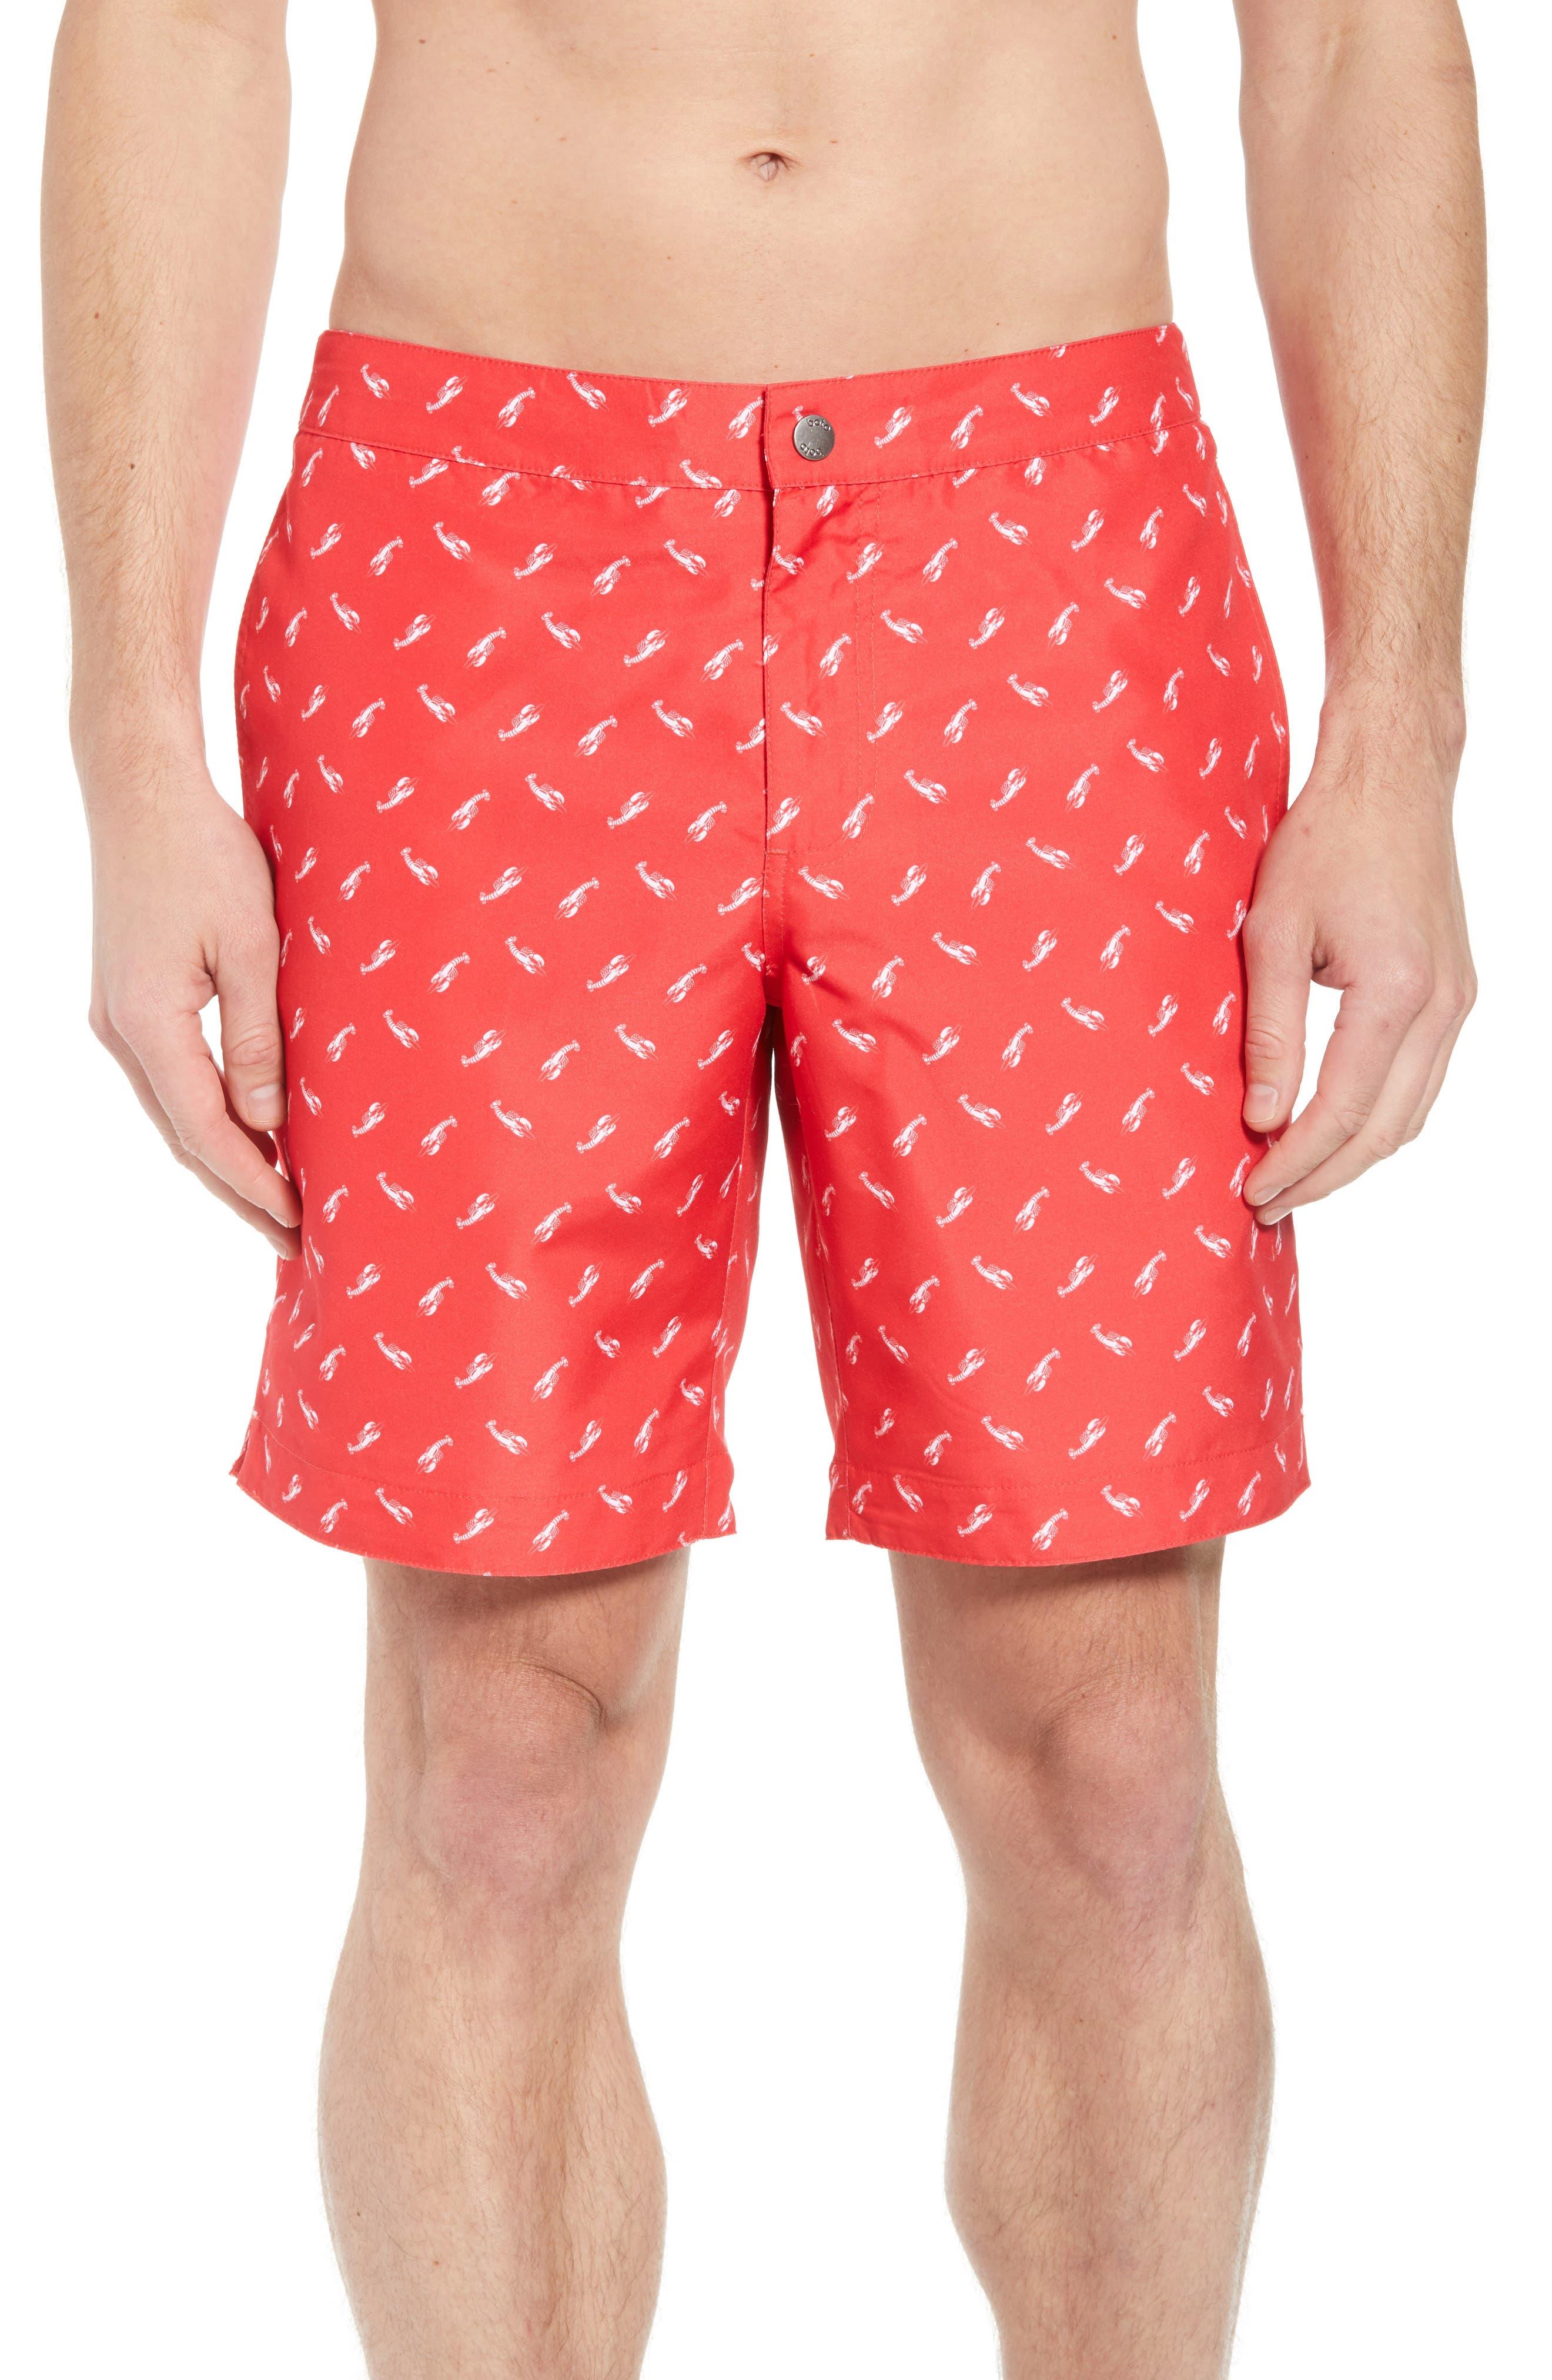 Aruba Slim Fit Swim Trunks,                             Main thumbnail 1, color,                             Red Lobsters Print